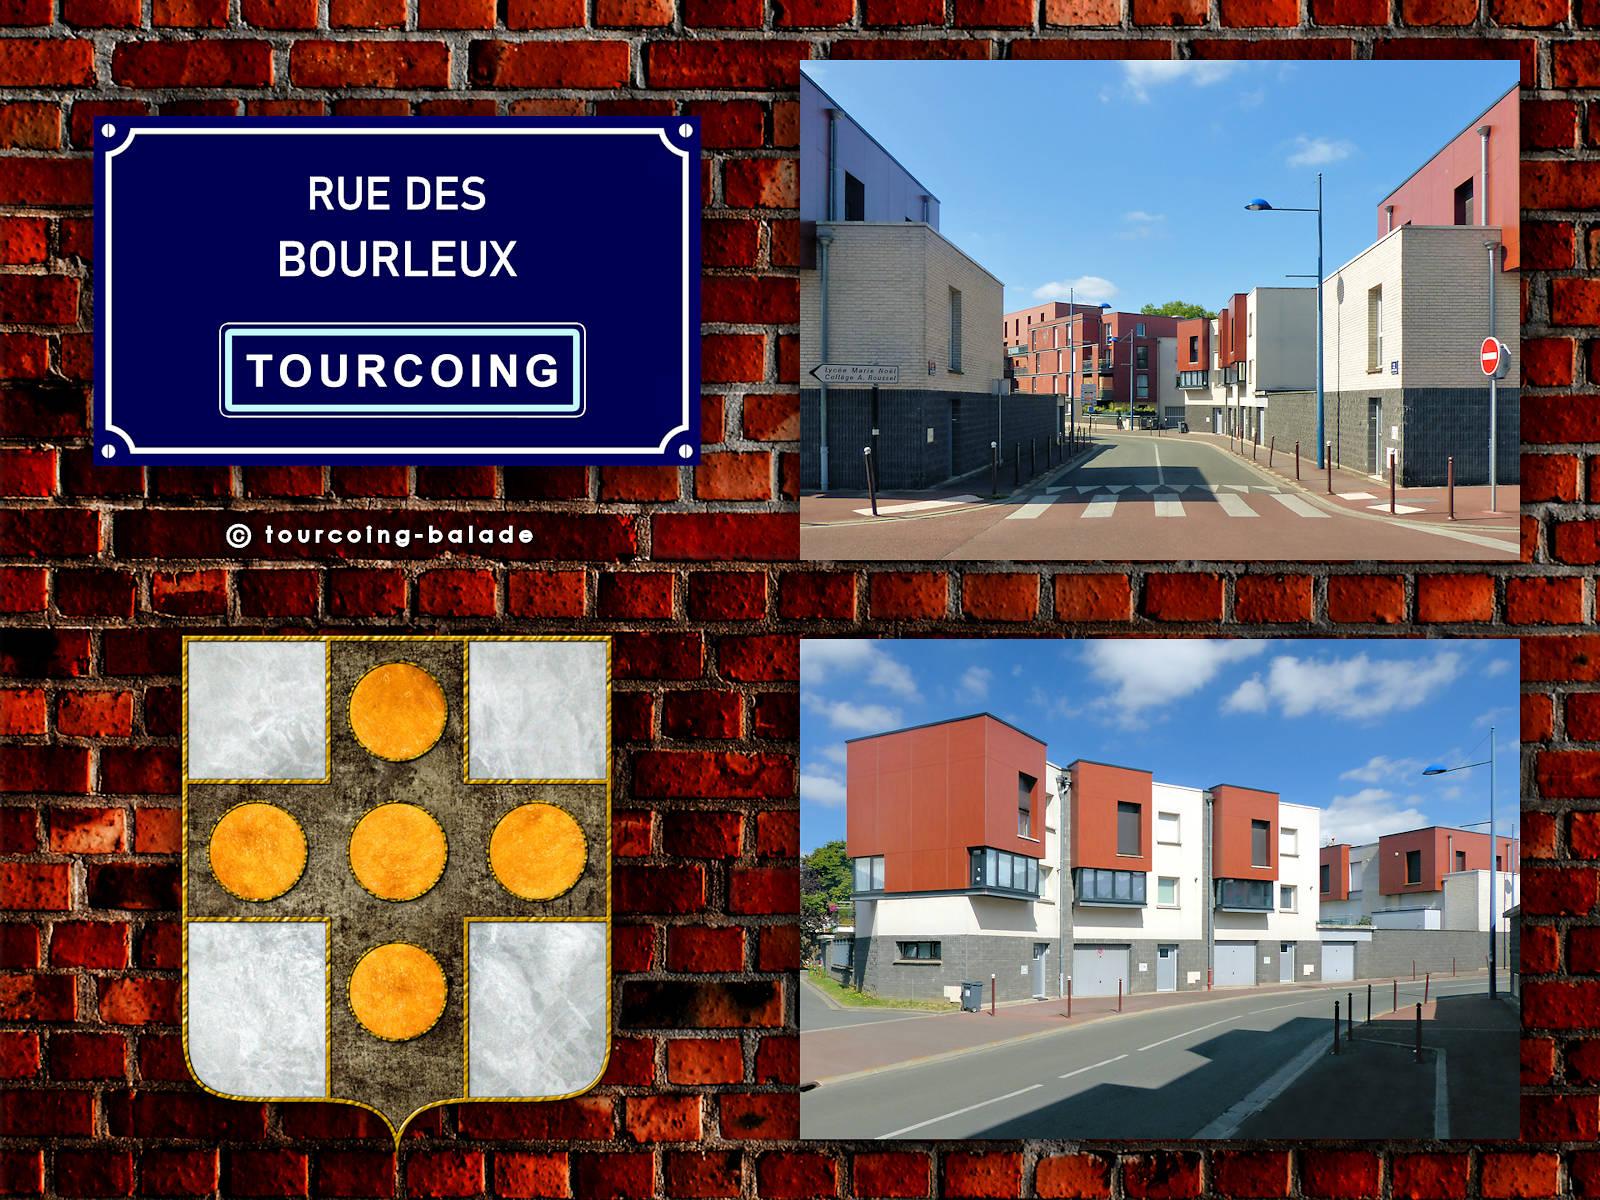 Rue des Bourleux, Tourcoing 2020